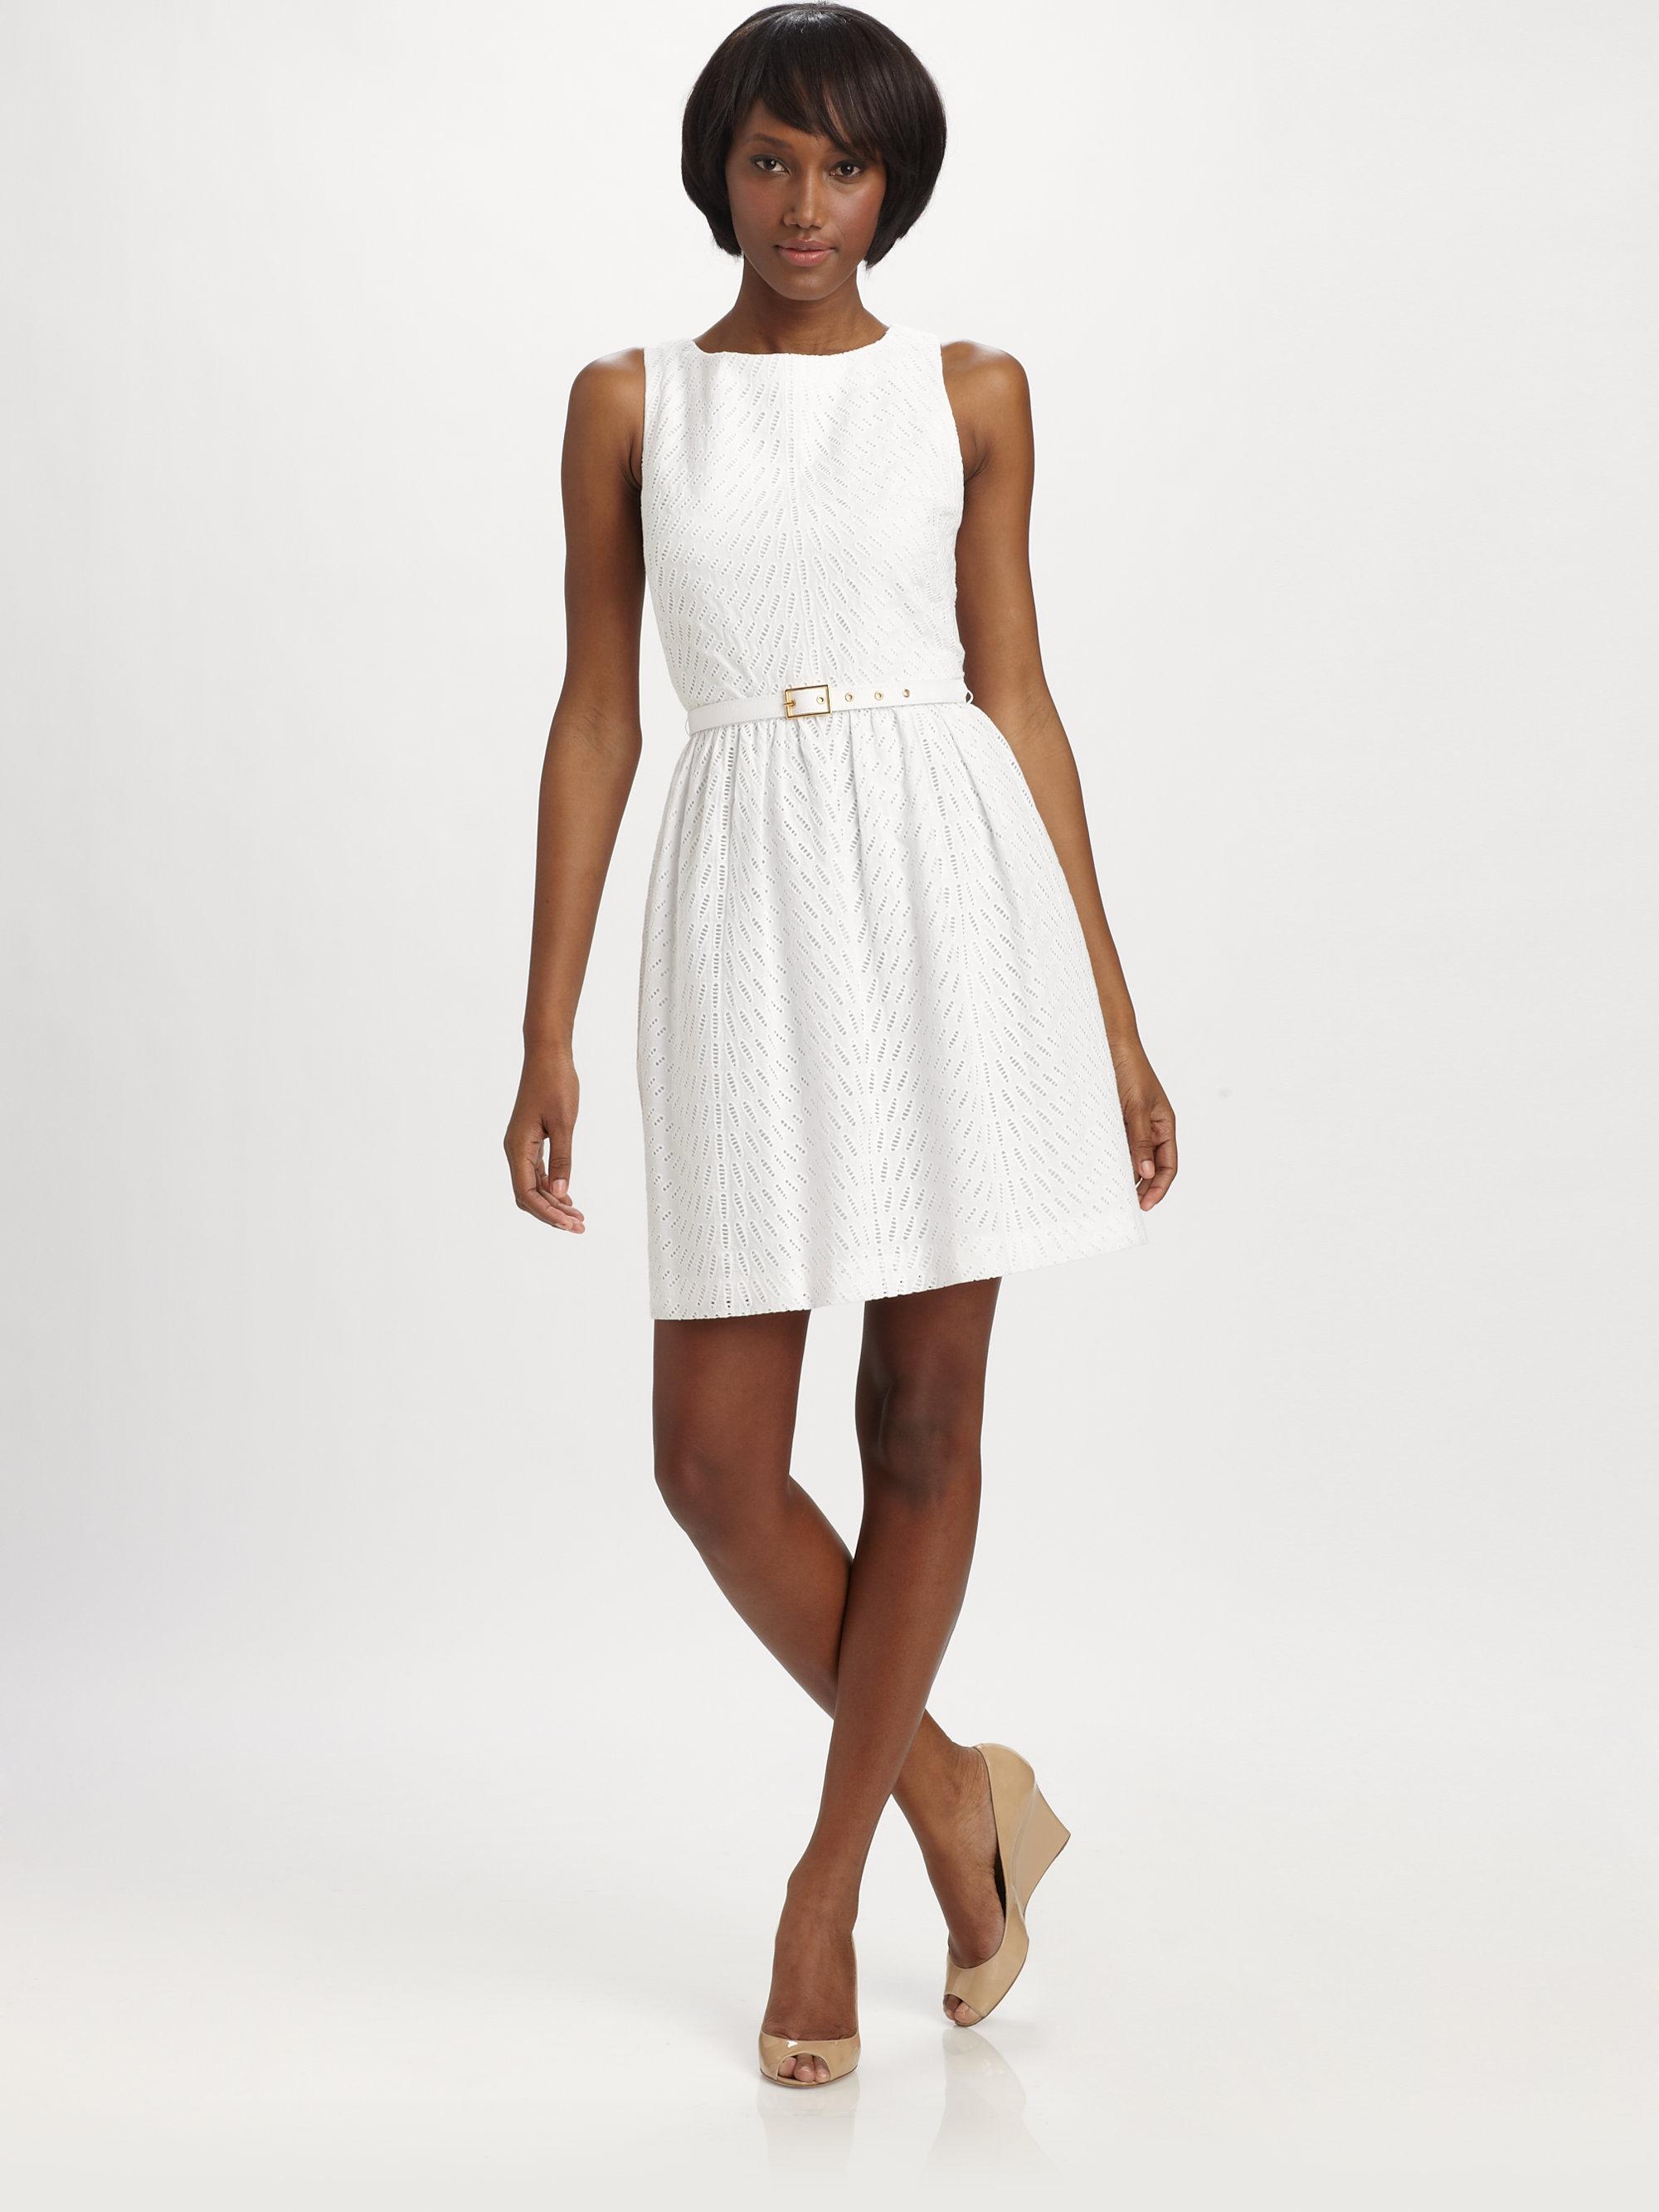 eeca49b0e77 Trina Turk Belted Eyelet Dress in White - Lyst